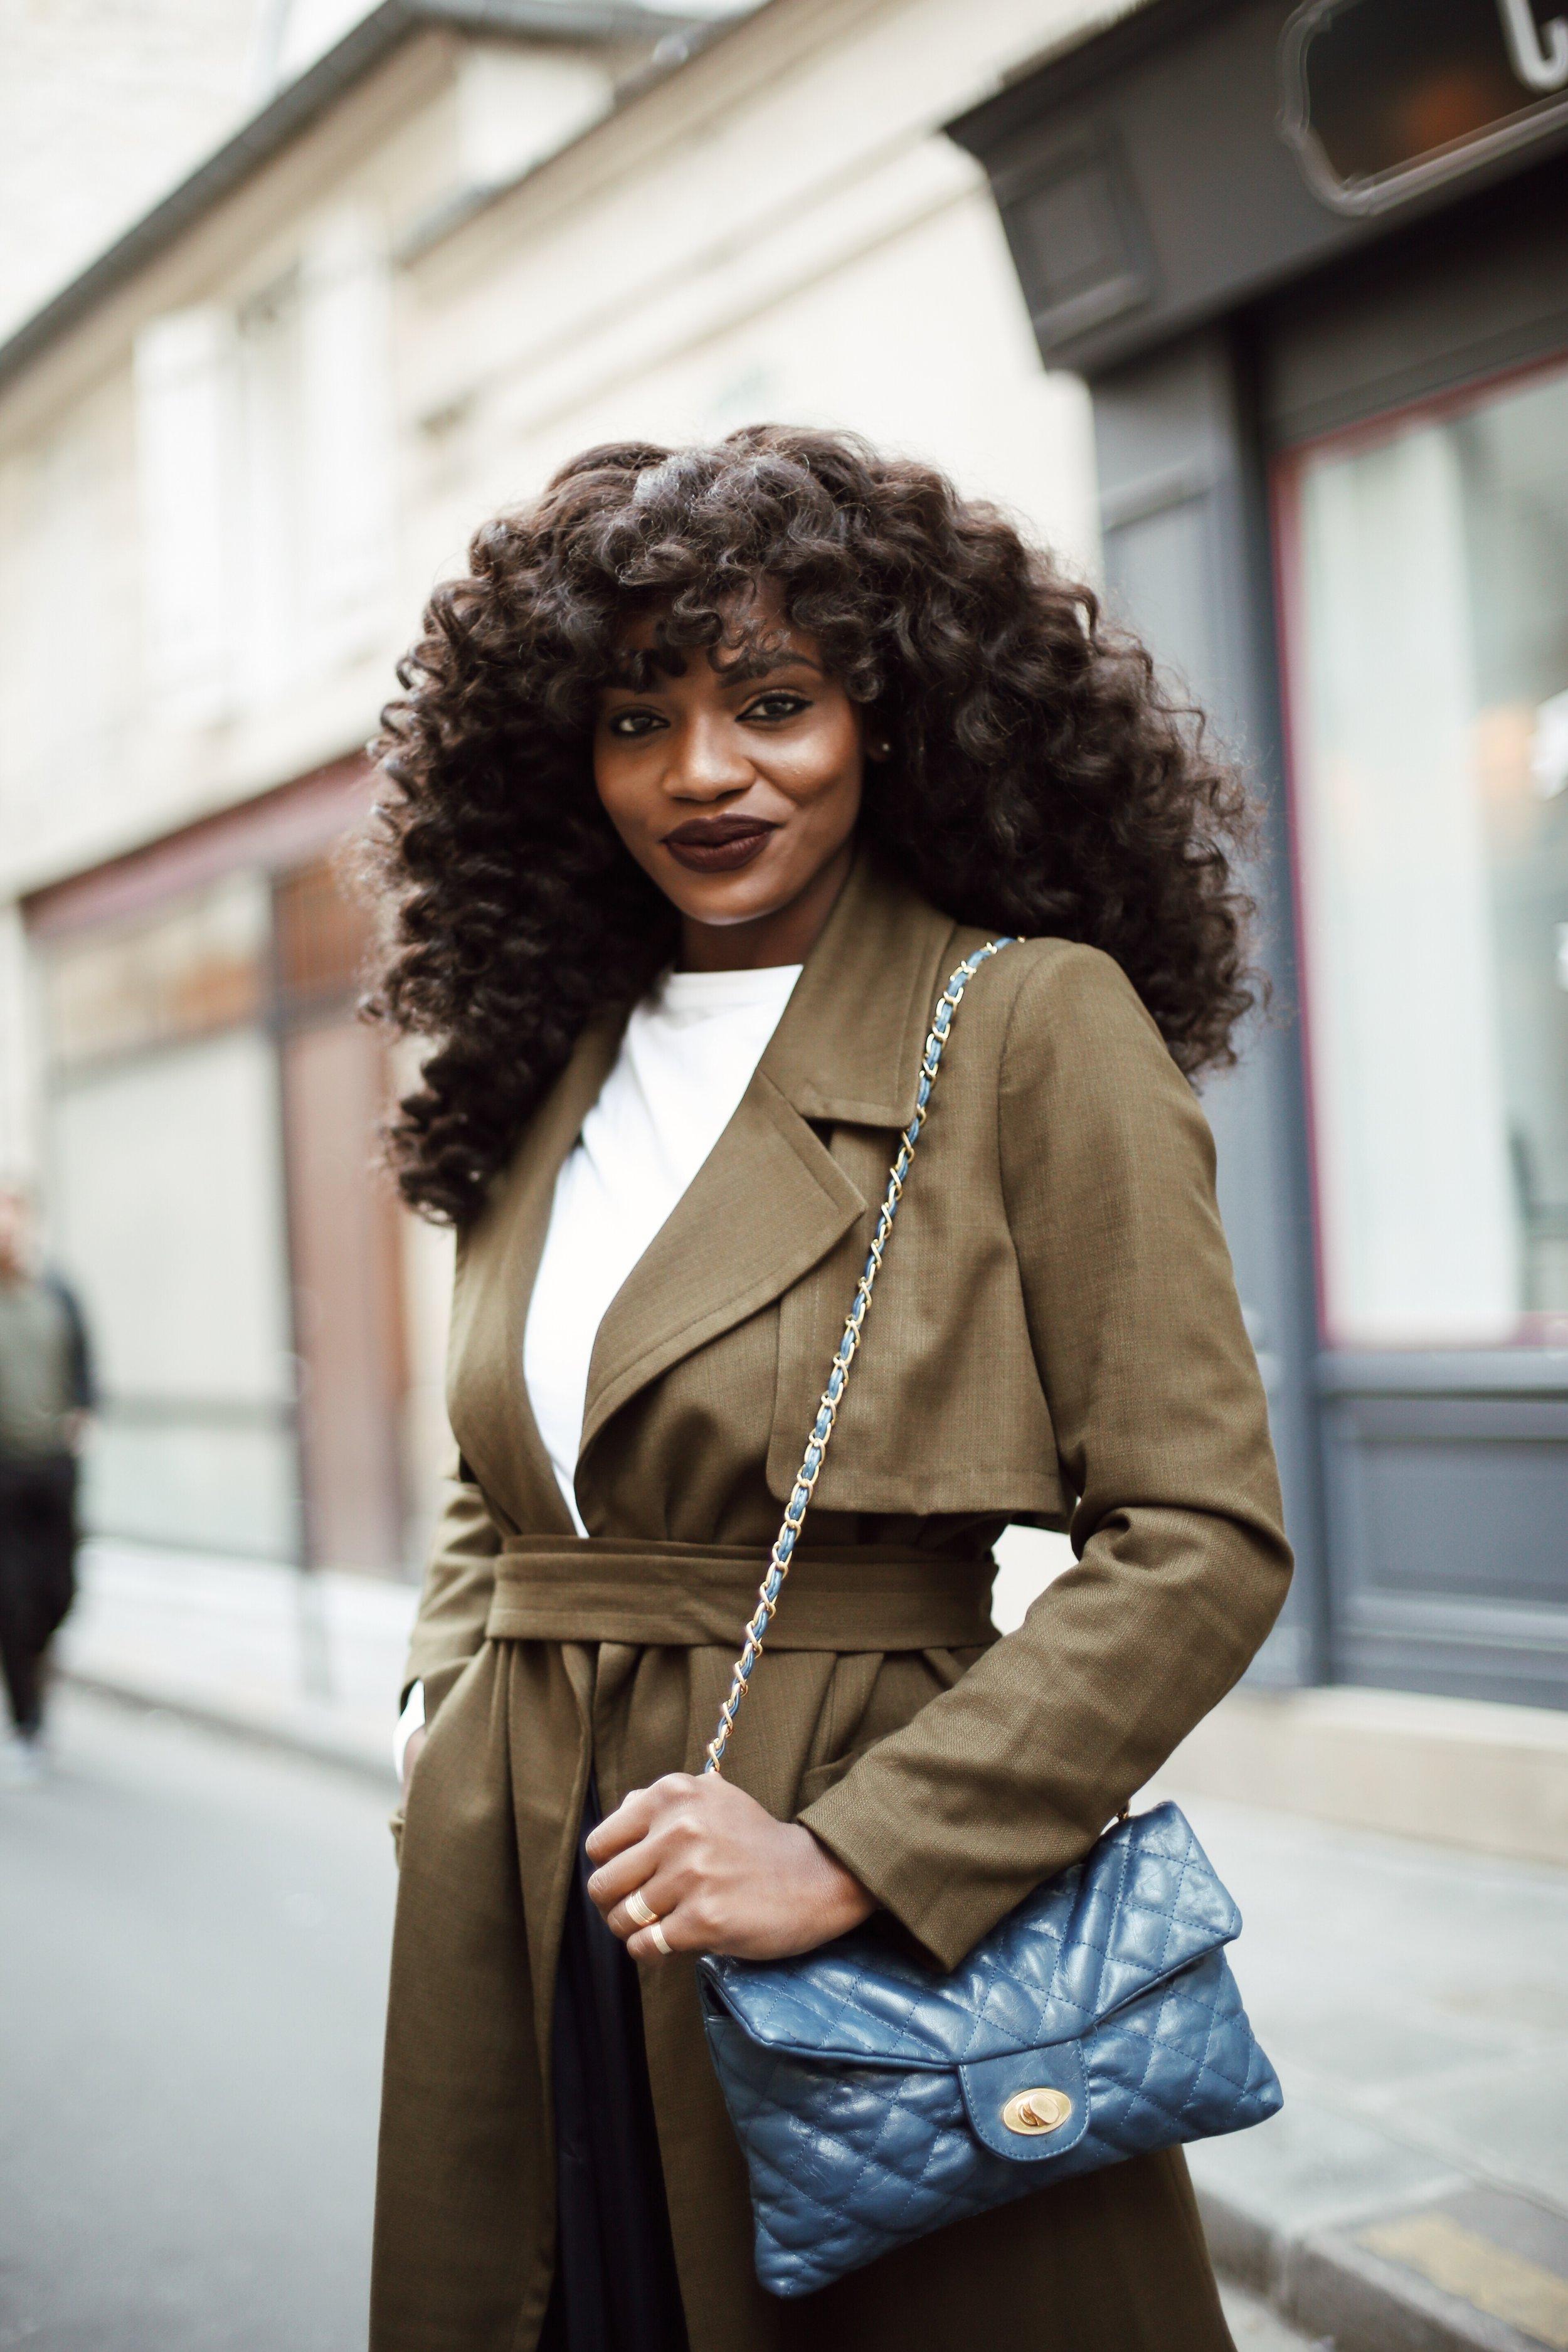 Olive Green Trench Coat in Paris | Asiyami Gold